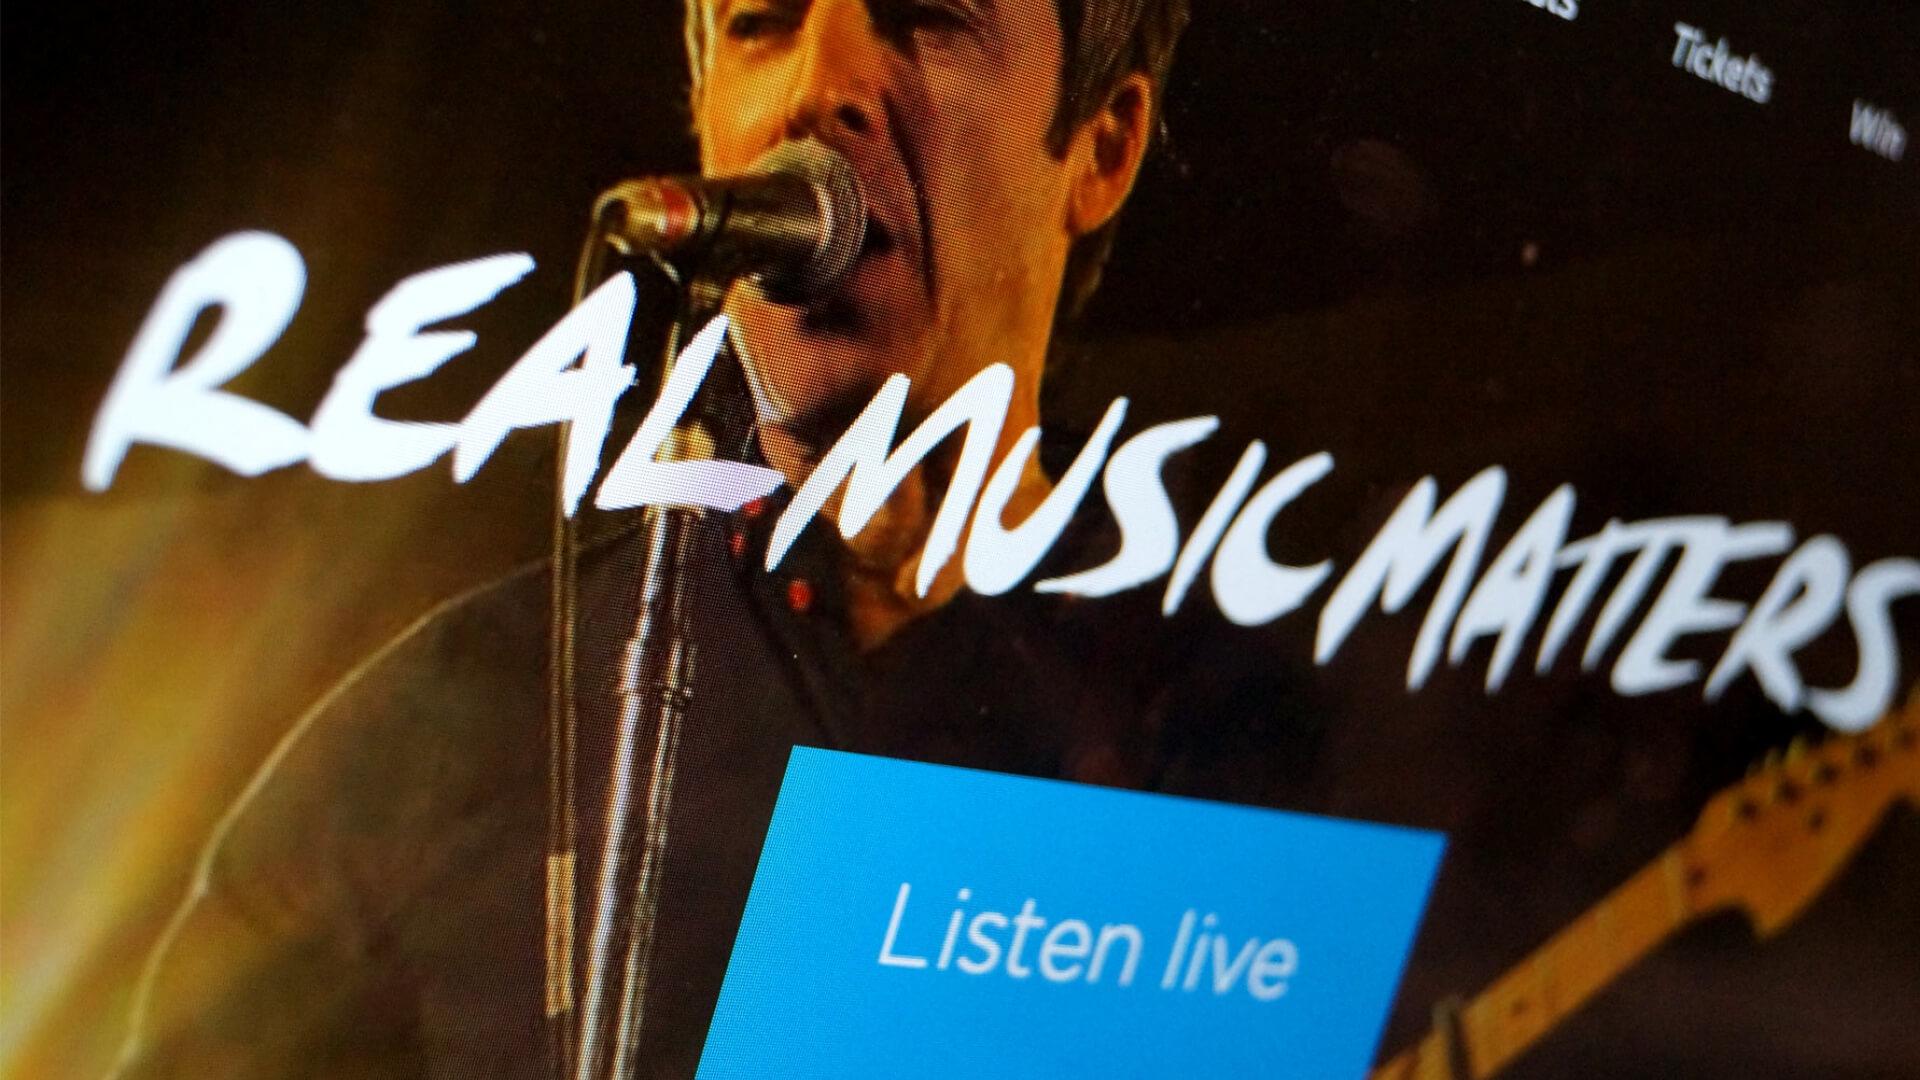 Absolute radio live event design